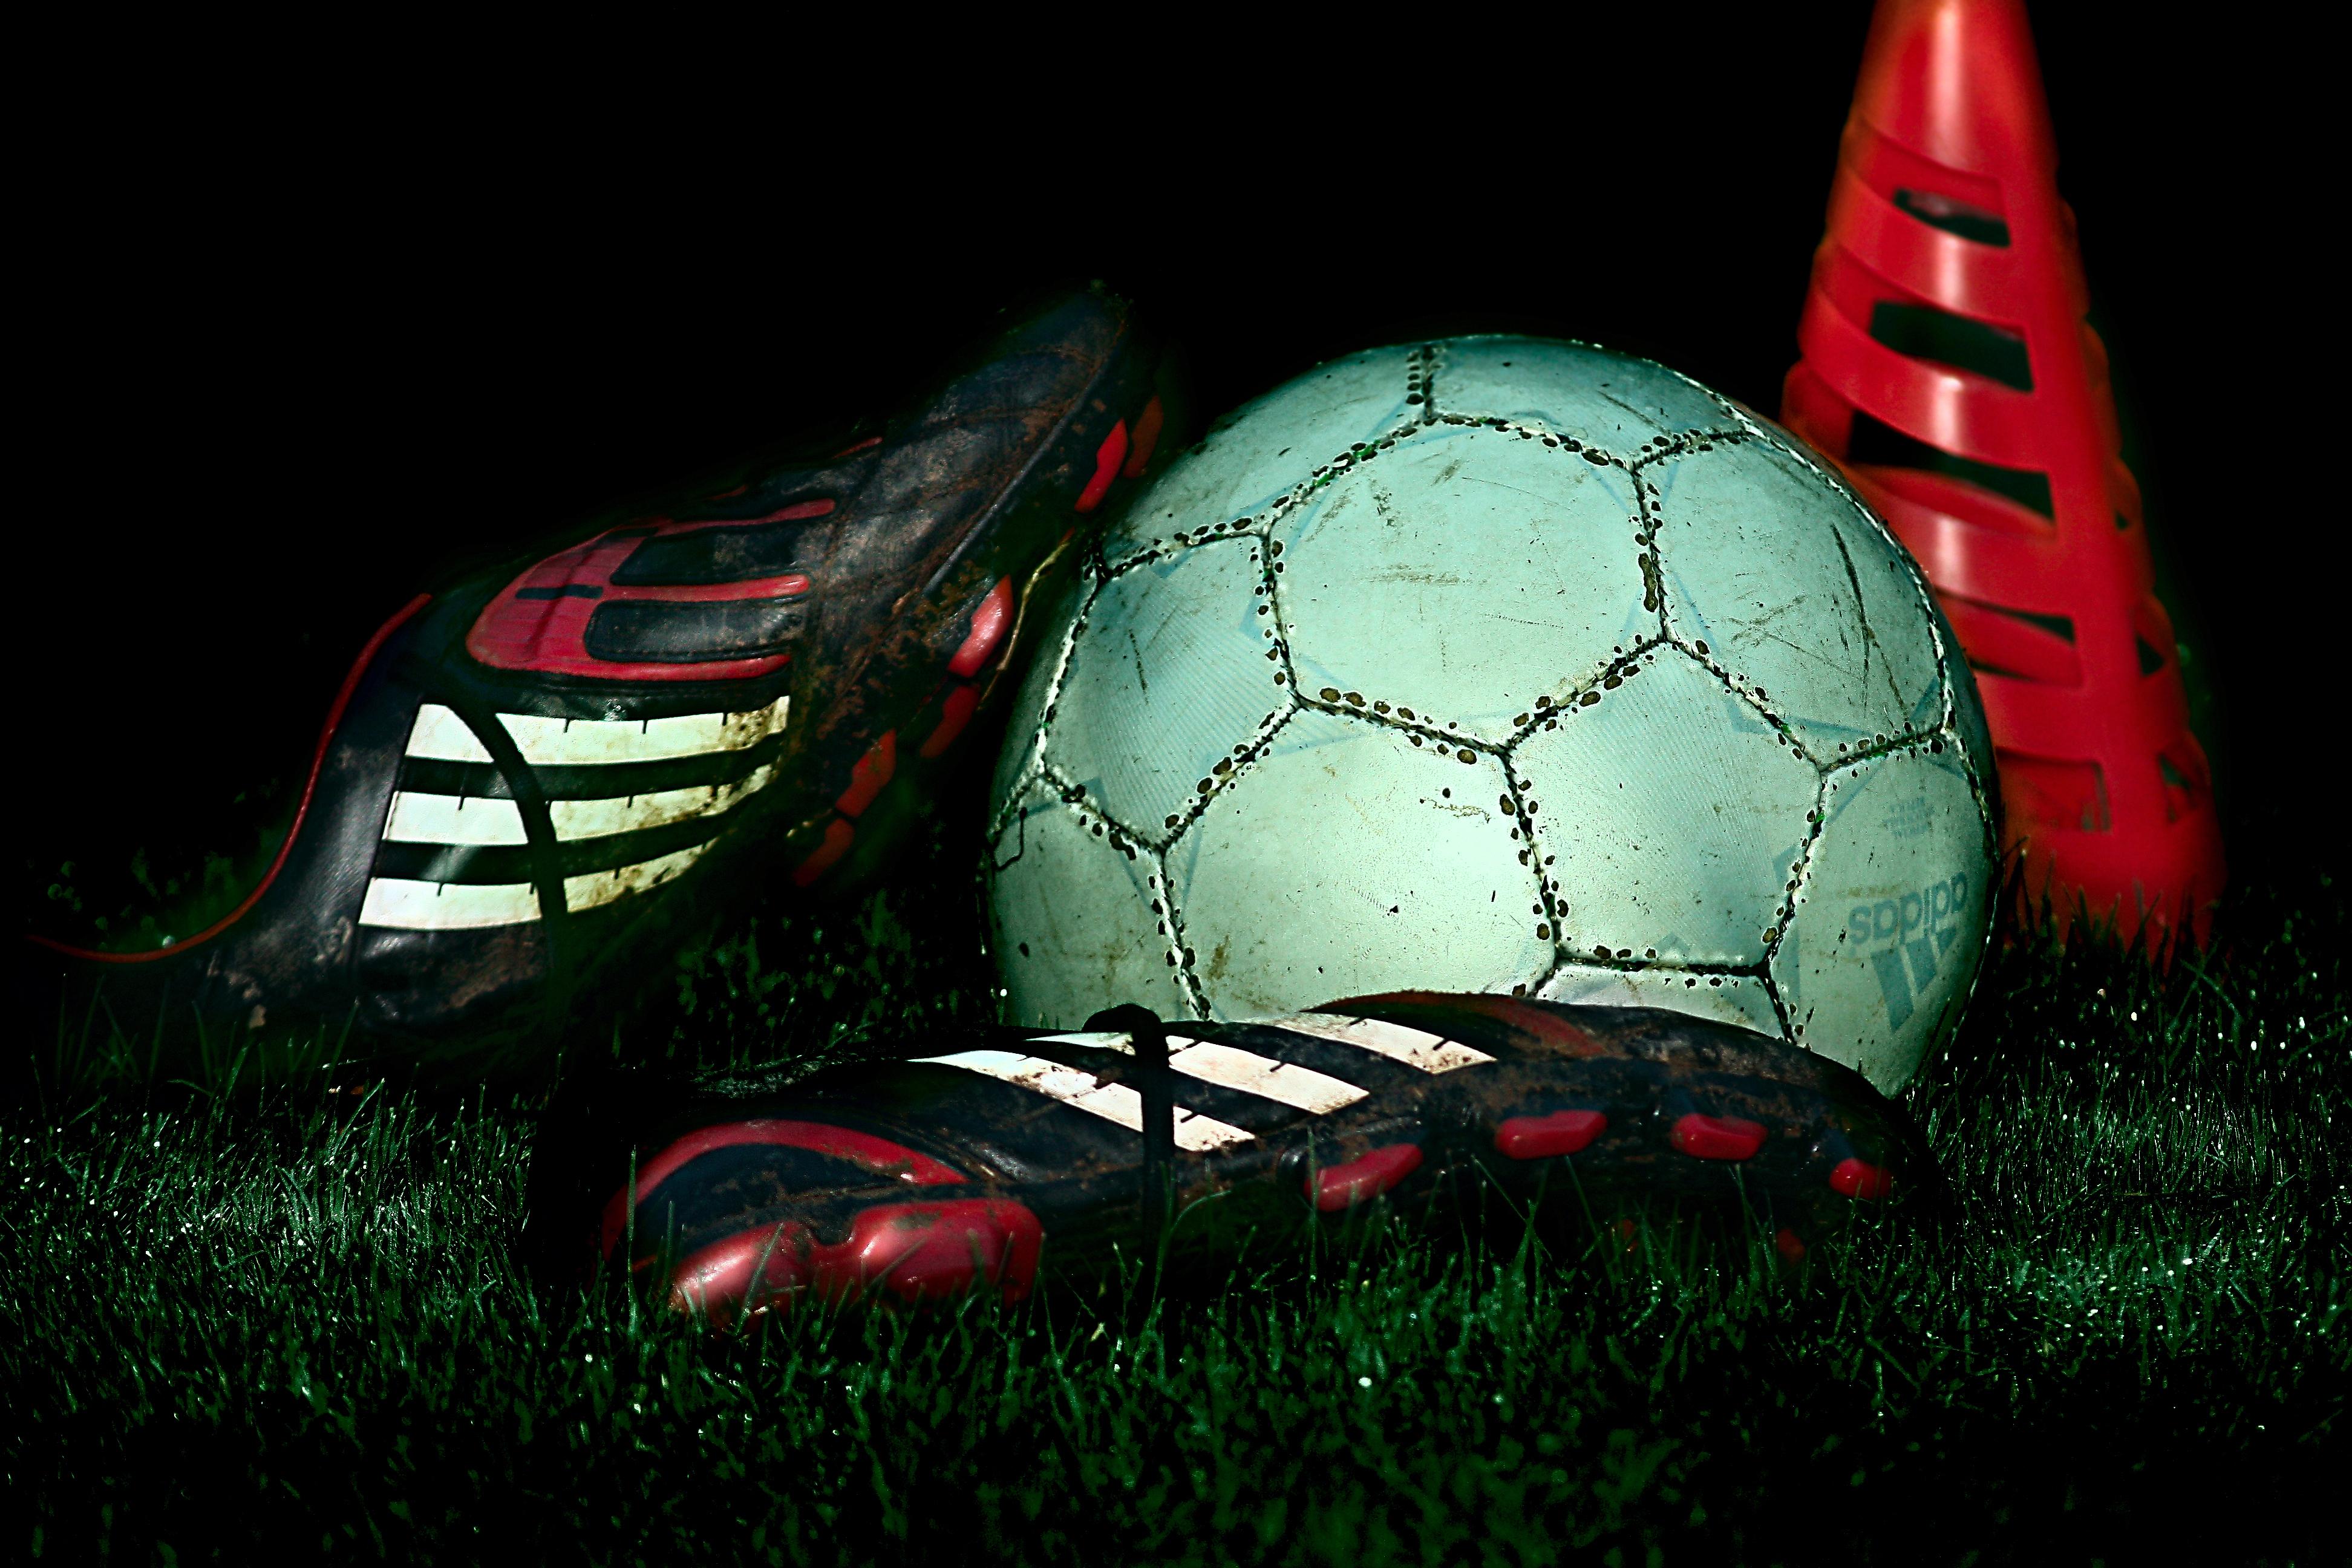 Football soccer futbol by walexxx19